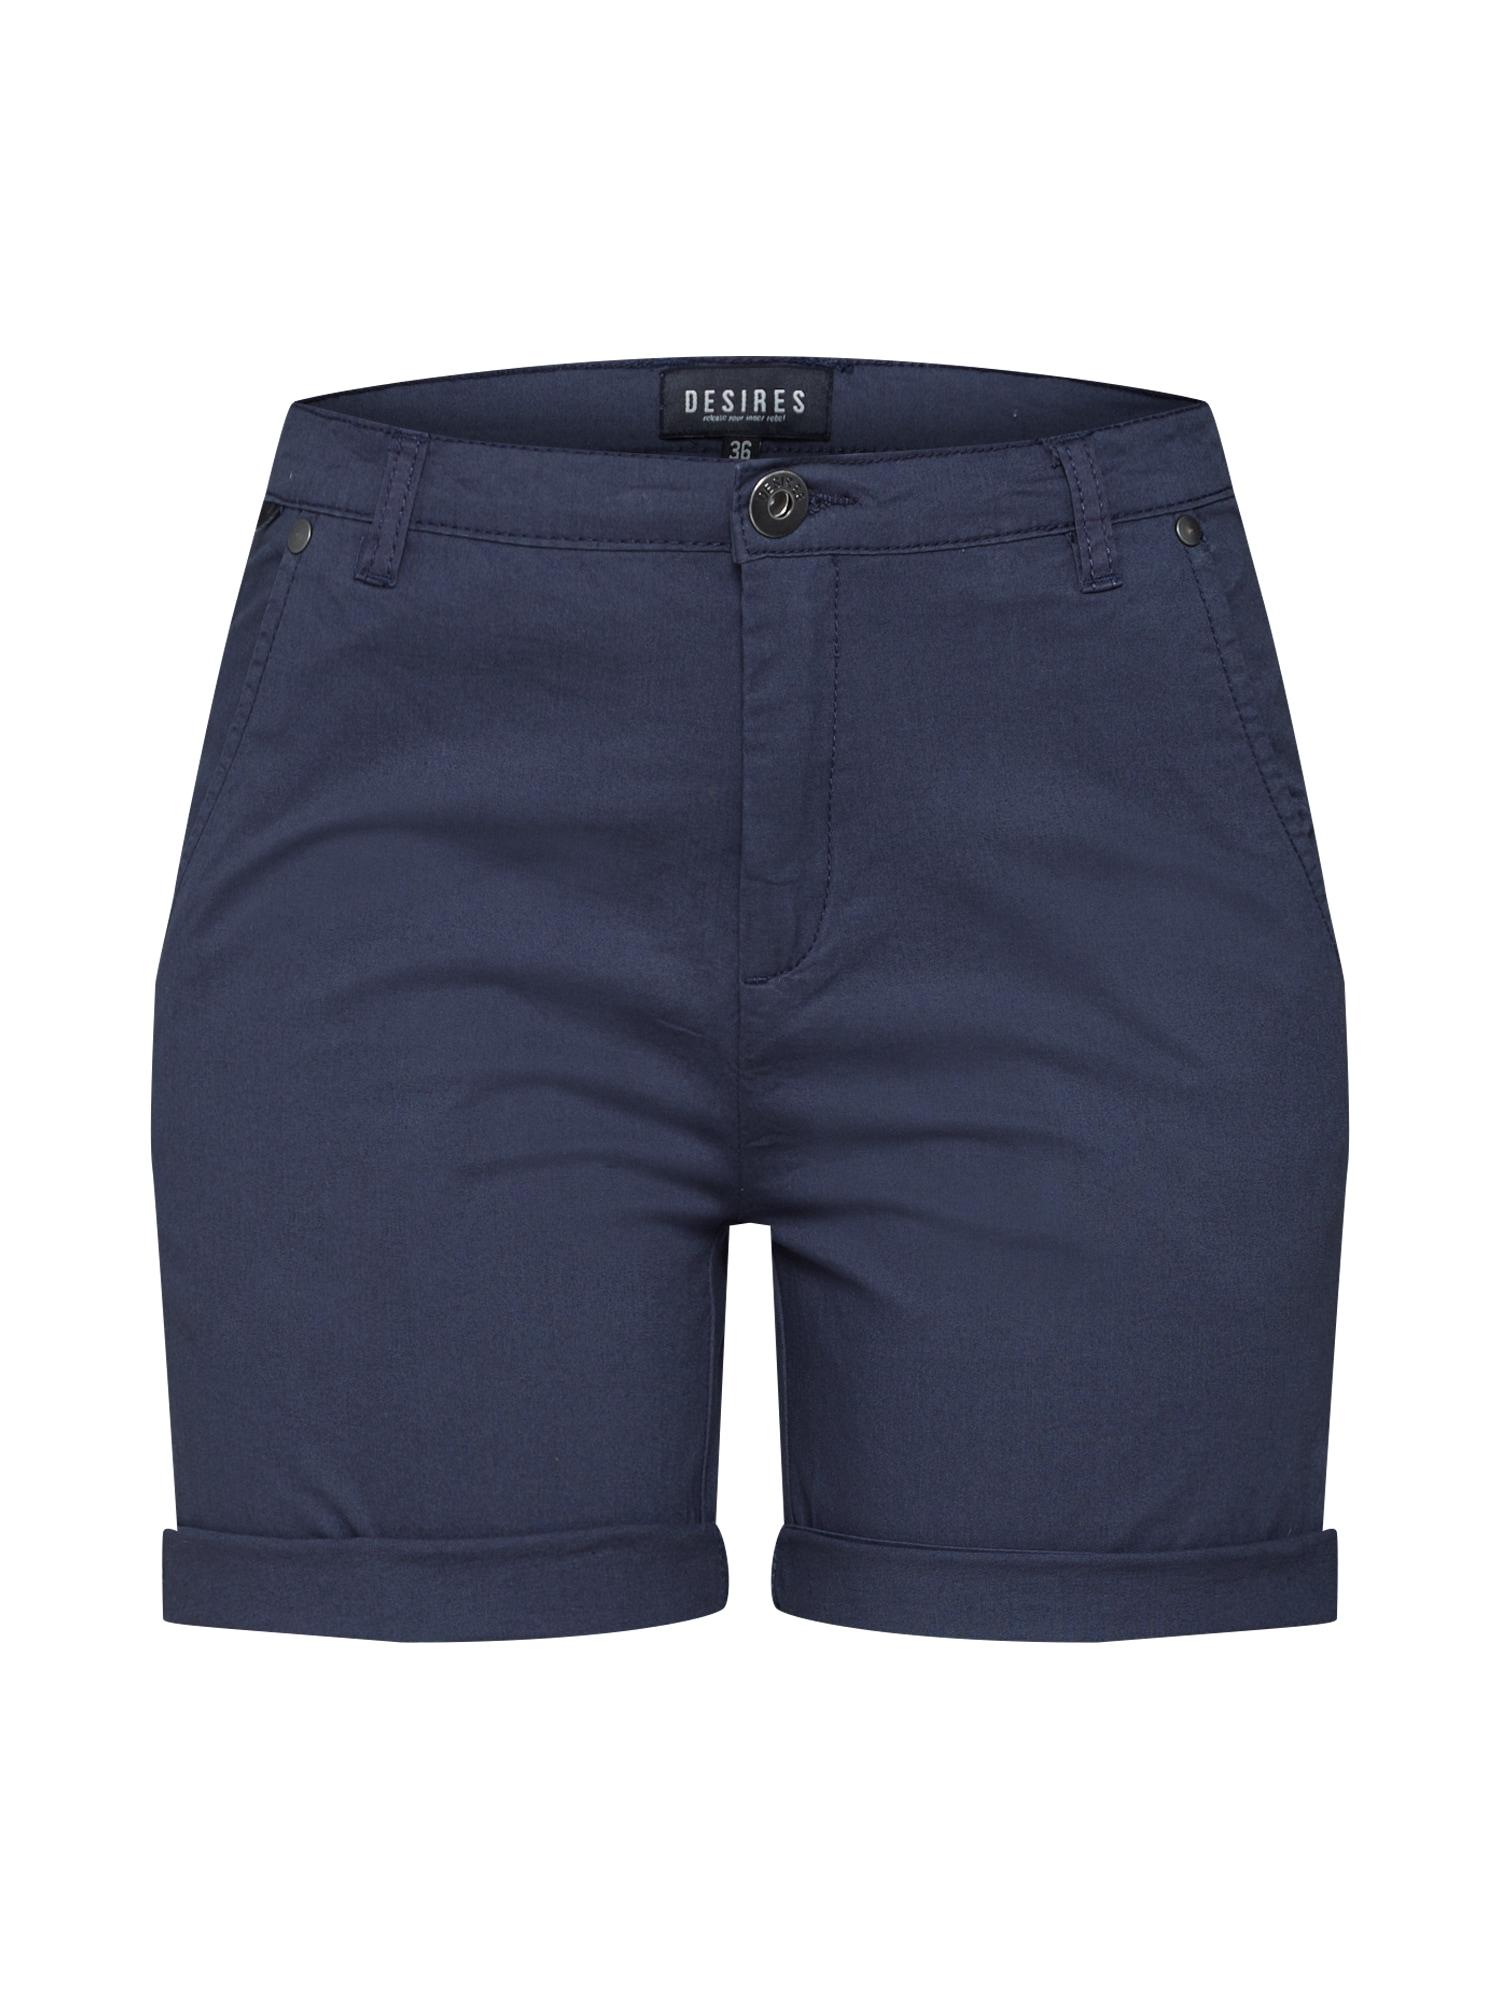 Kalhoty Adina 1 tmavě modrá Desires